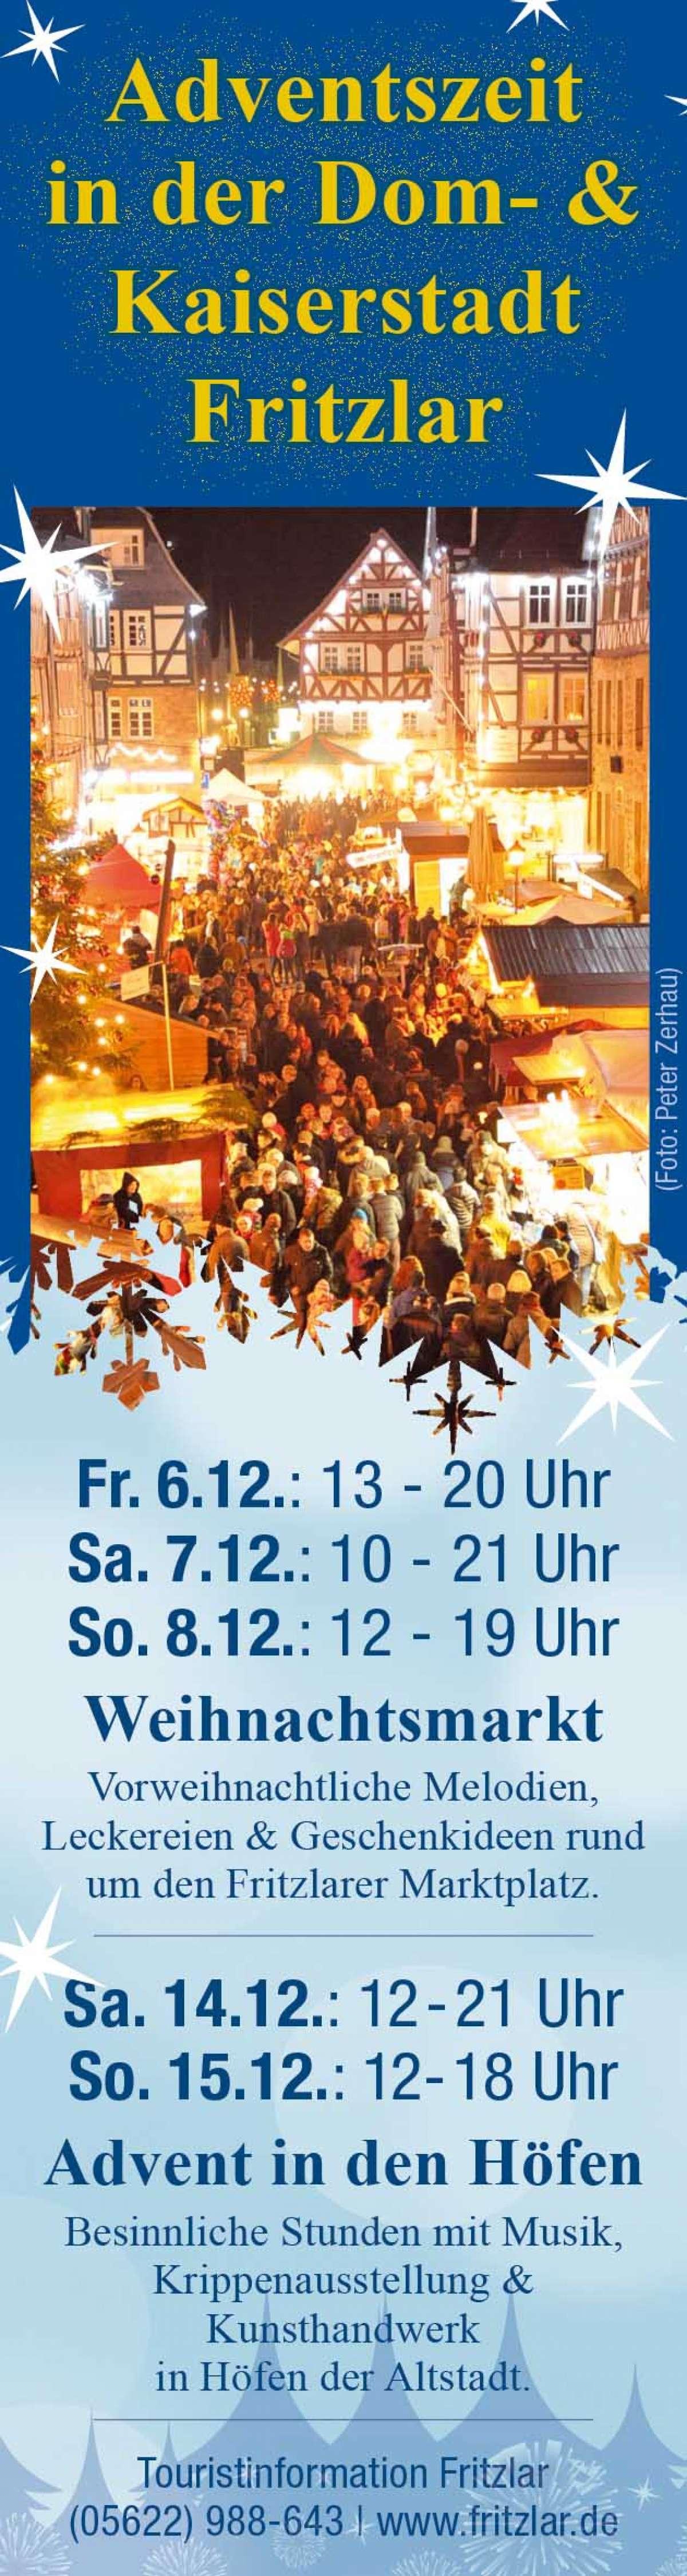 Veranstaltungen & Events in Fritzlar